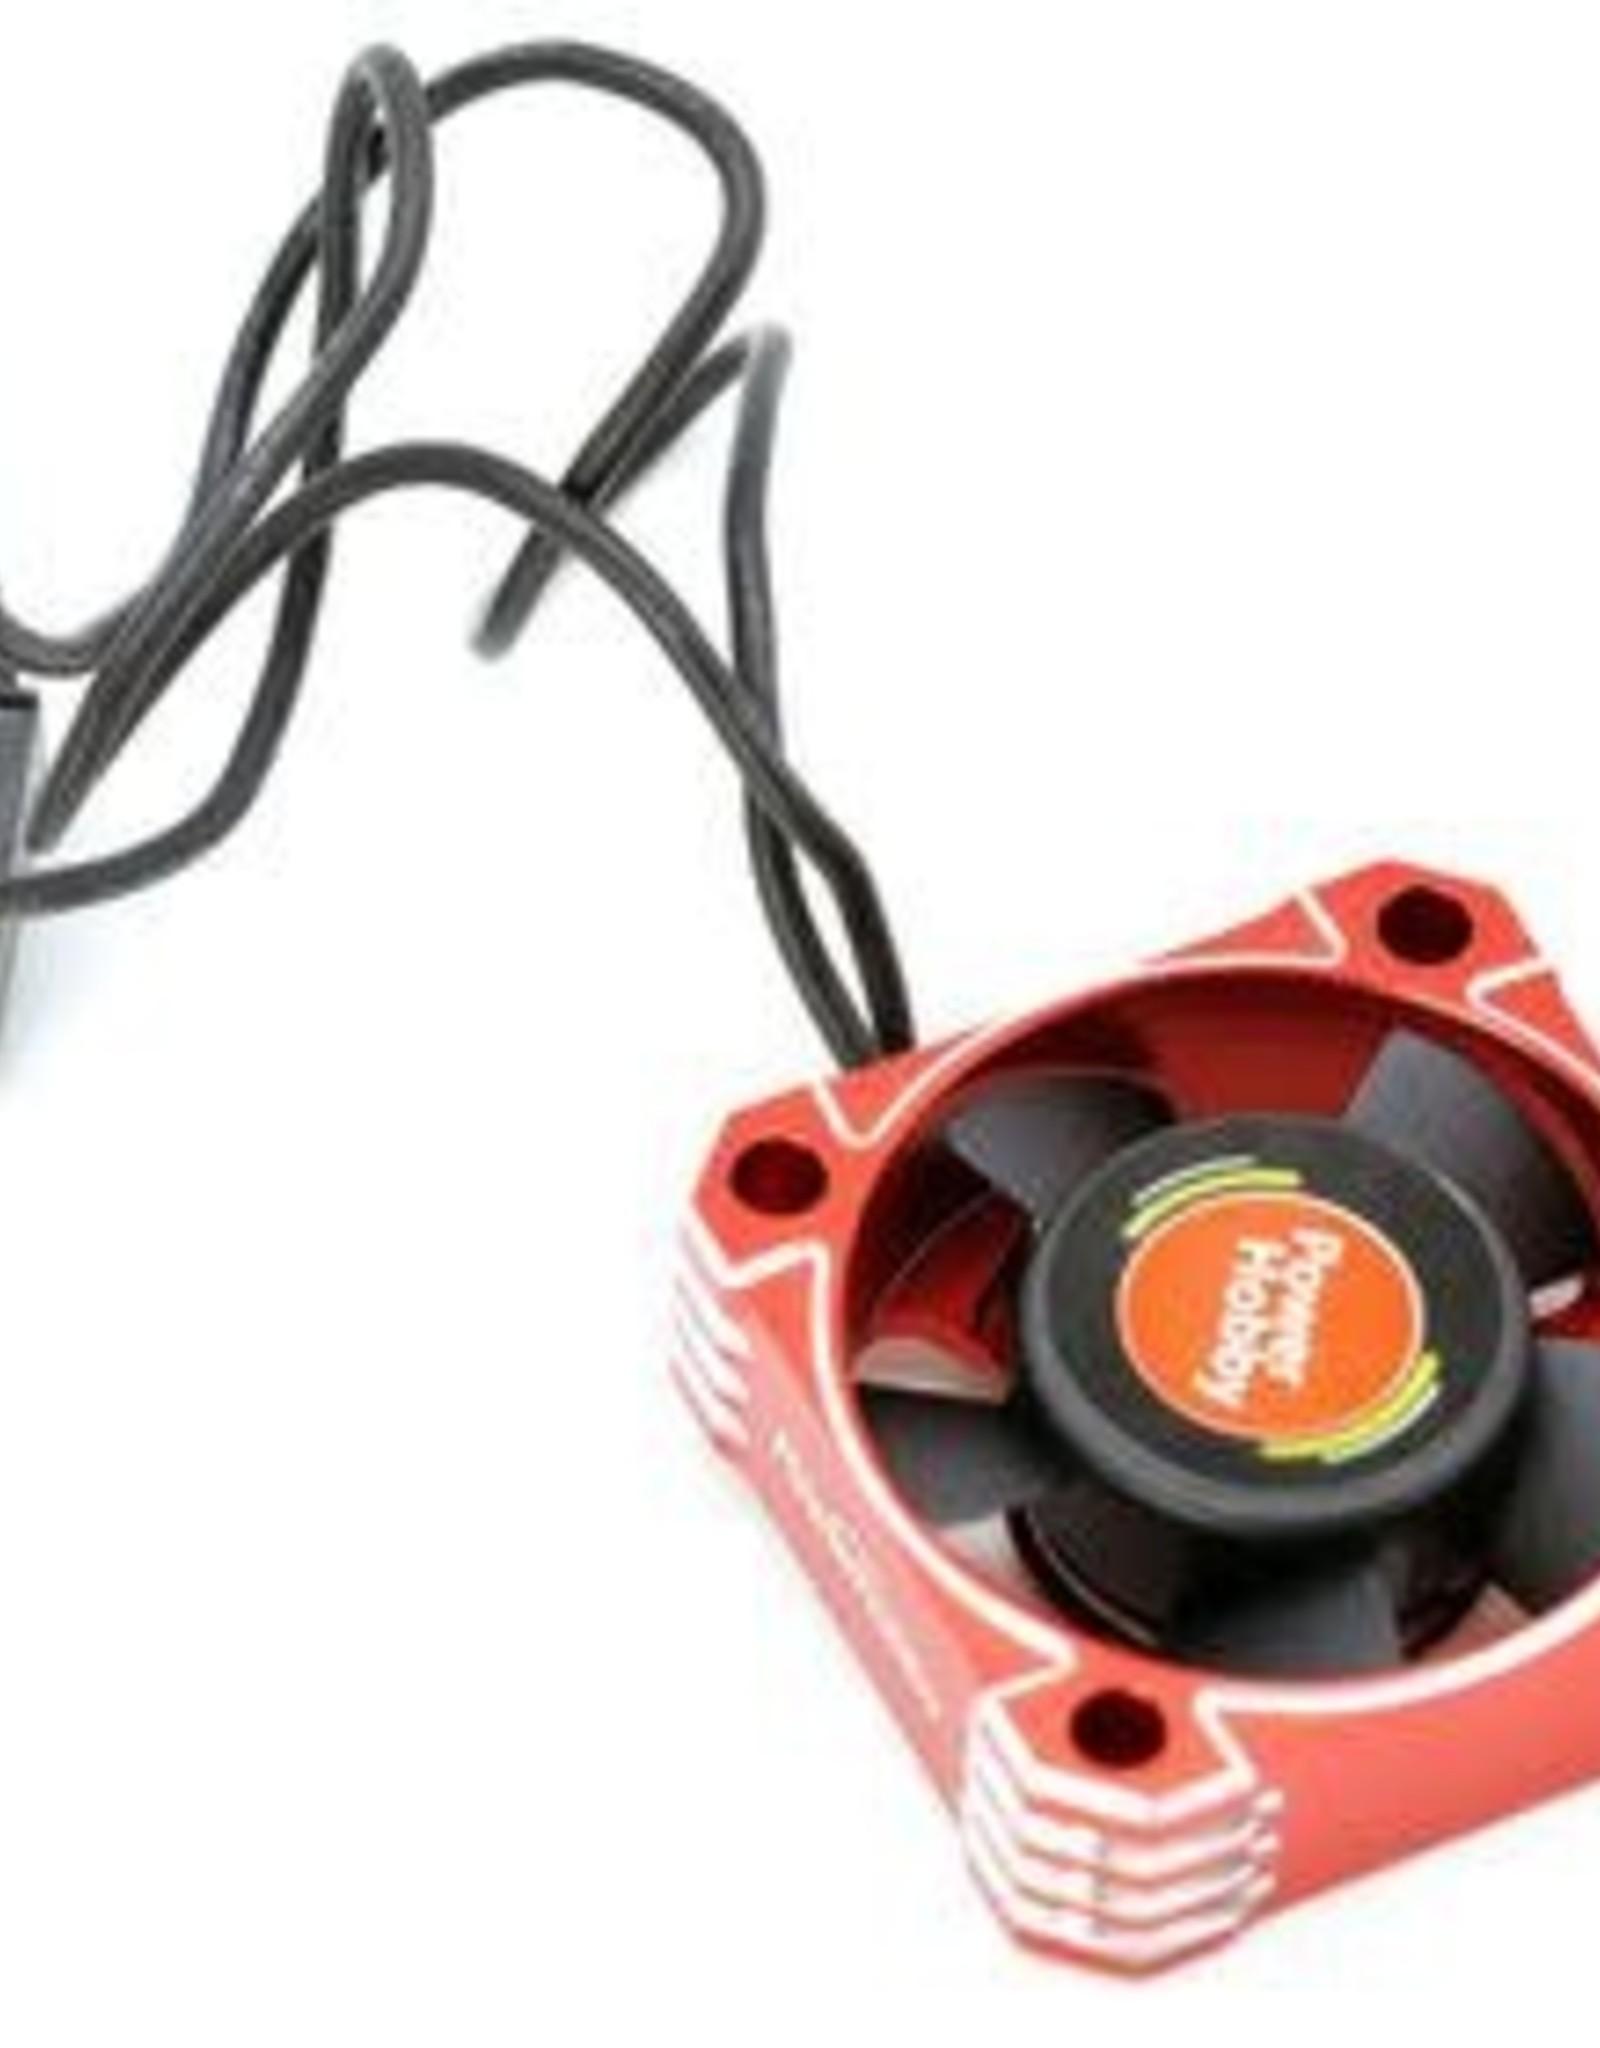 Power Hobby 30x30x10 Tornado High Speed Aluminum RC Cooling Fan 30MM-Red